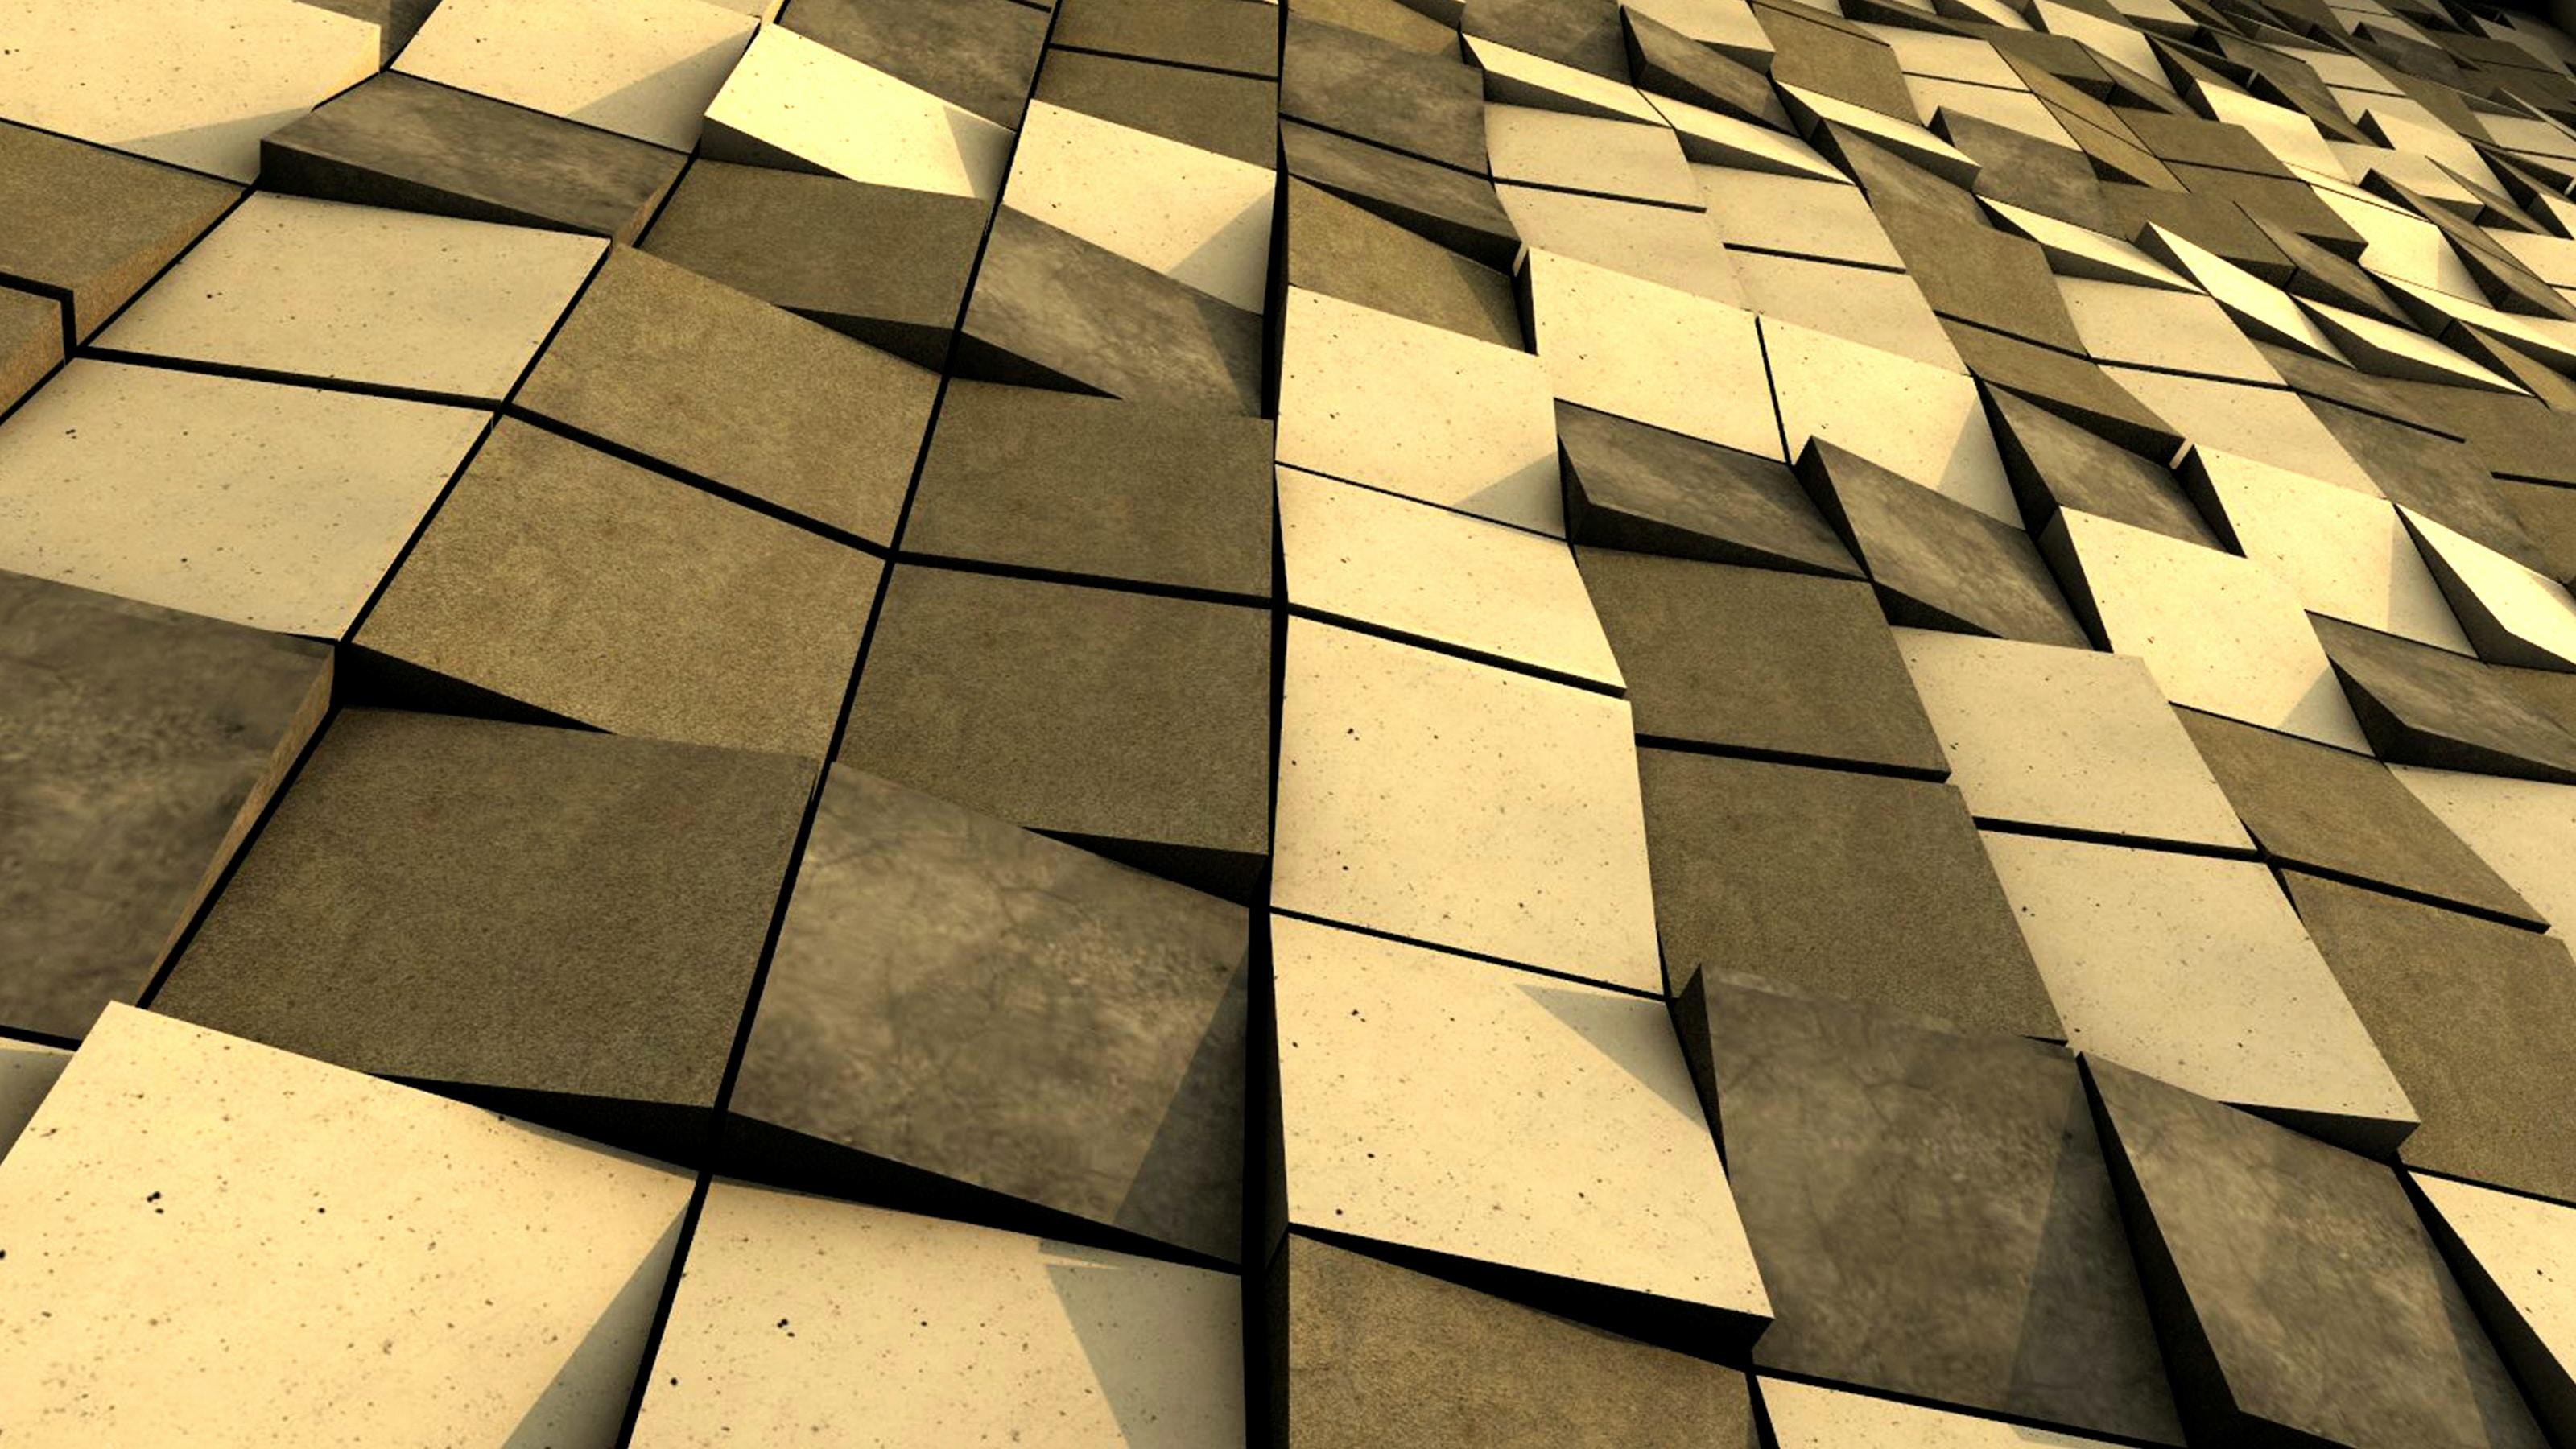 black and white tile lot